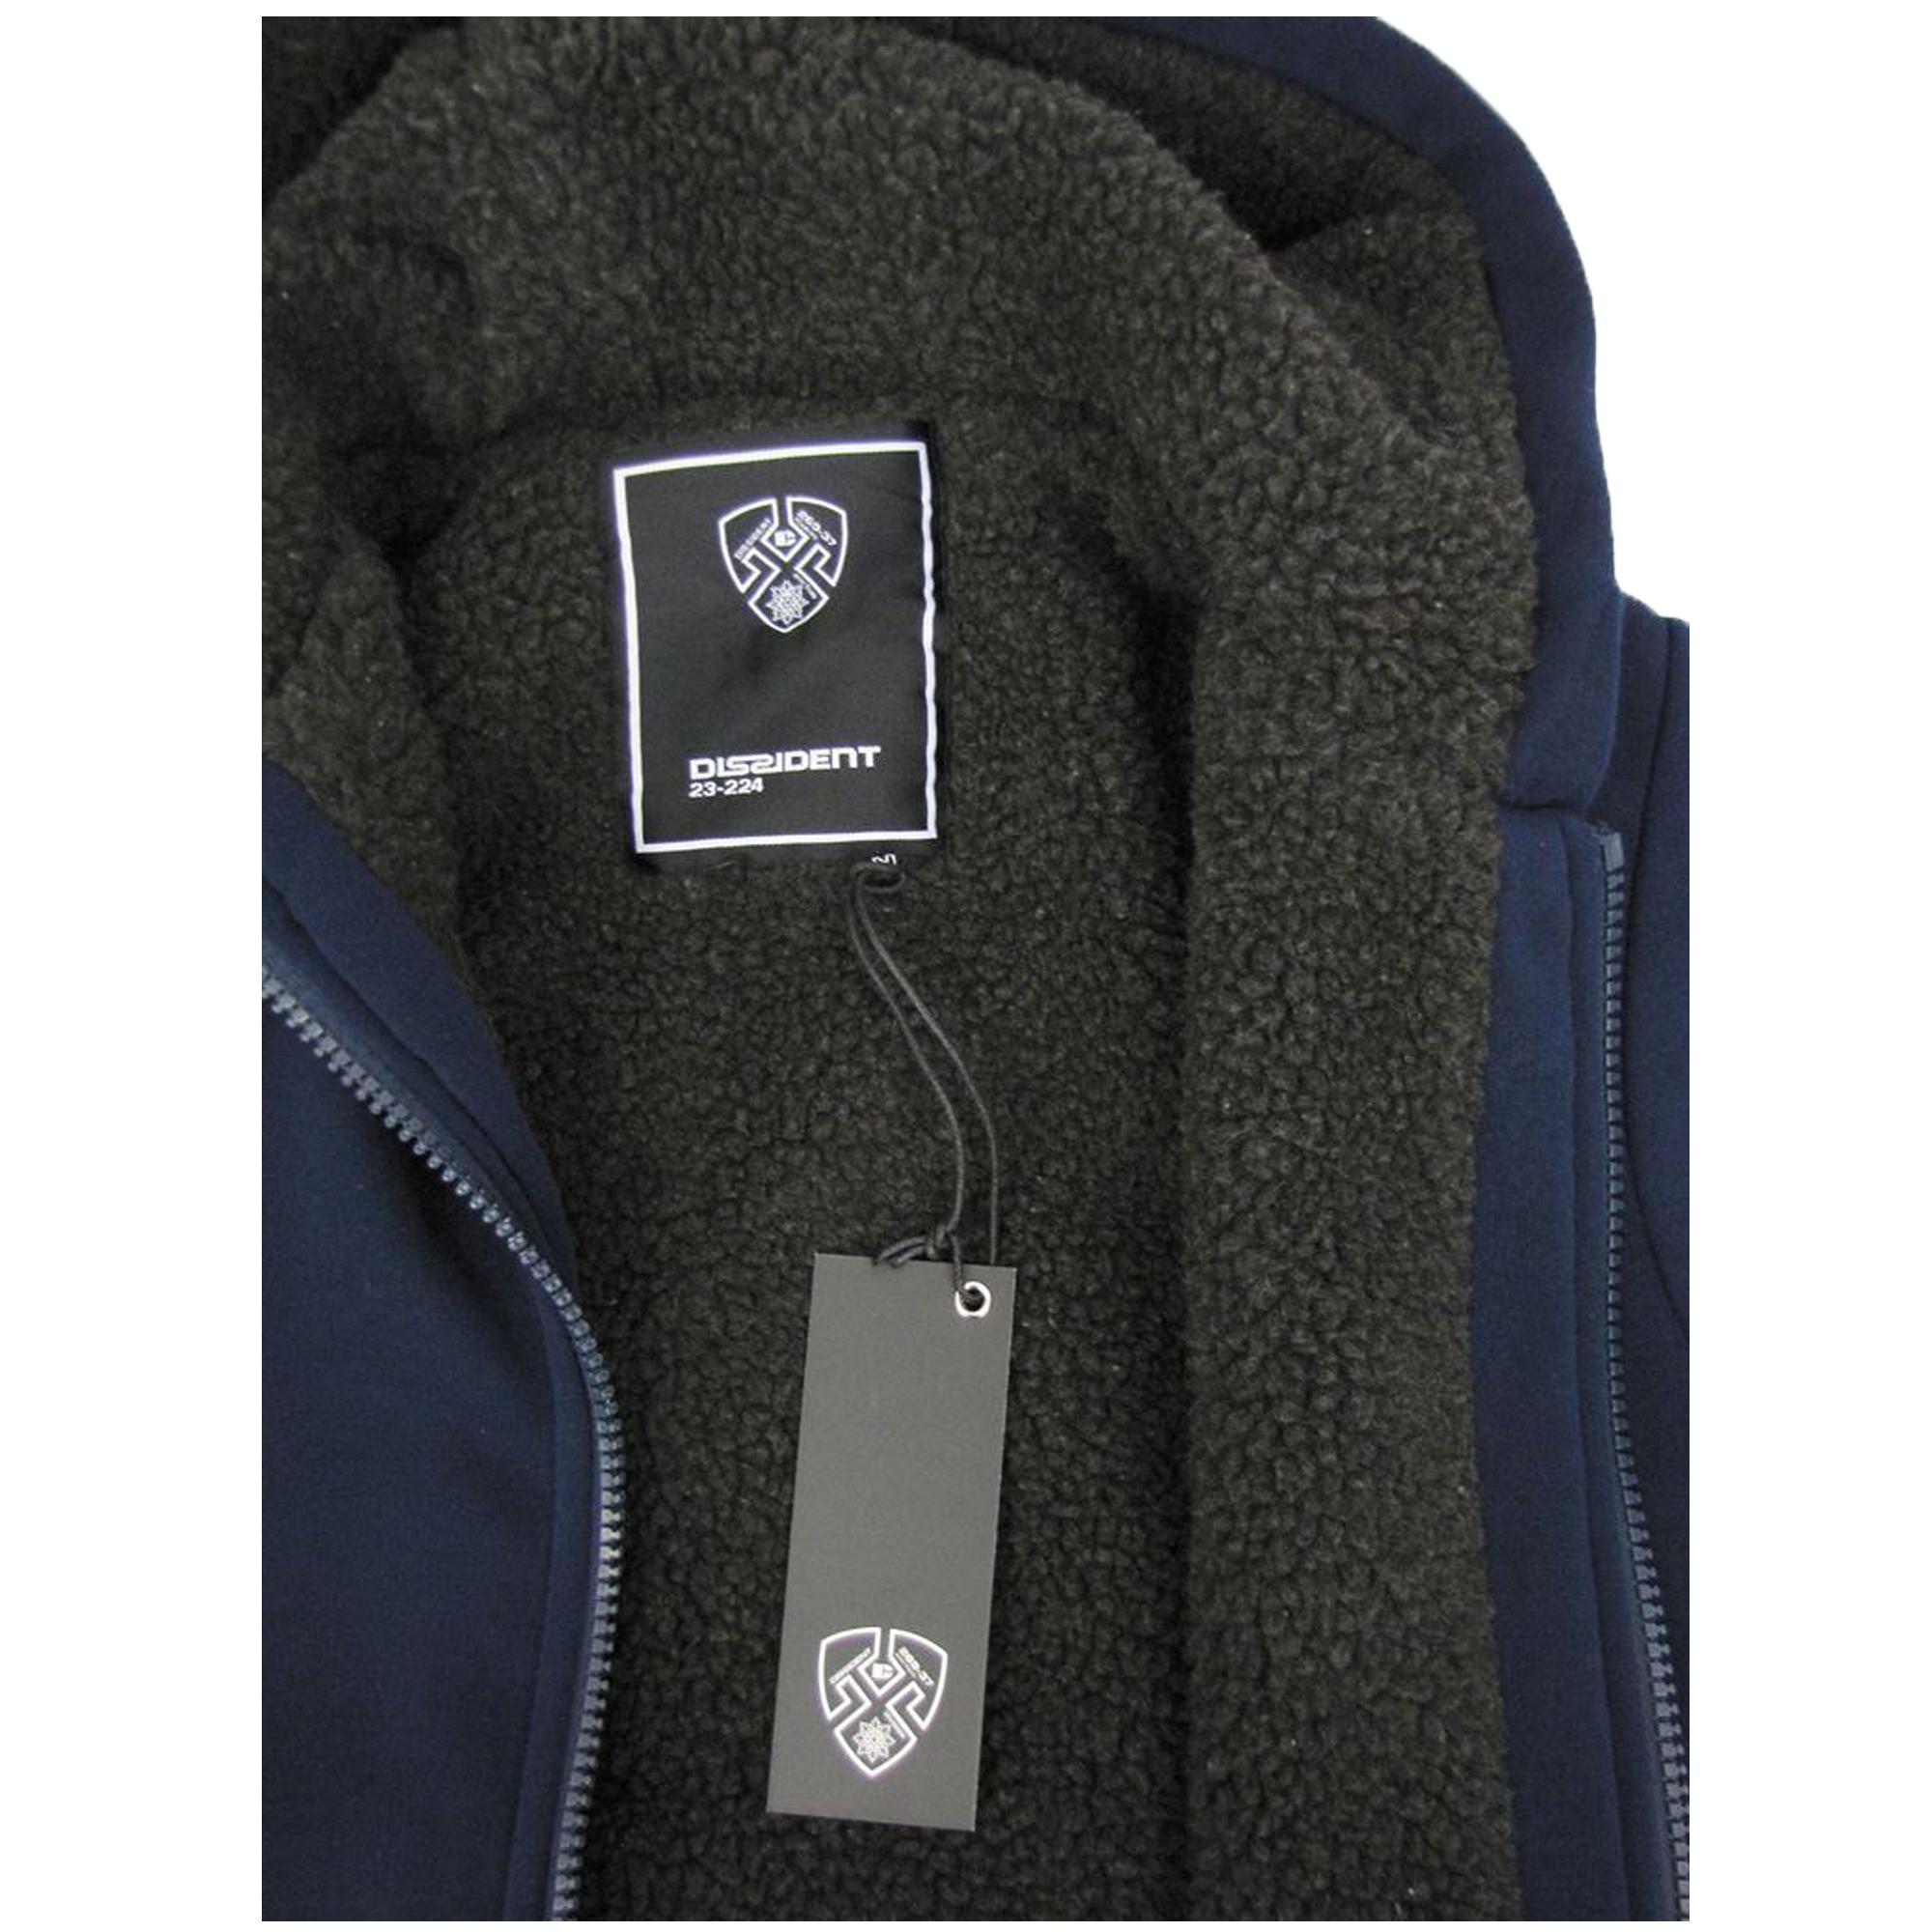 Mens-Jacket-Dissident-Sweatshirt-Hooded-Top-Sherpa-Fleece-Lined-Heavy-BOLO-New thumbnail 8